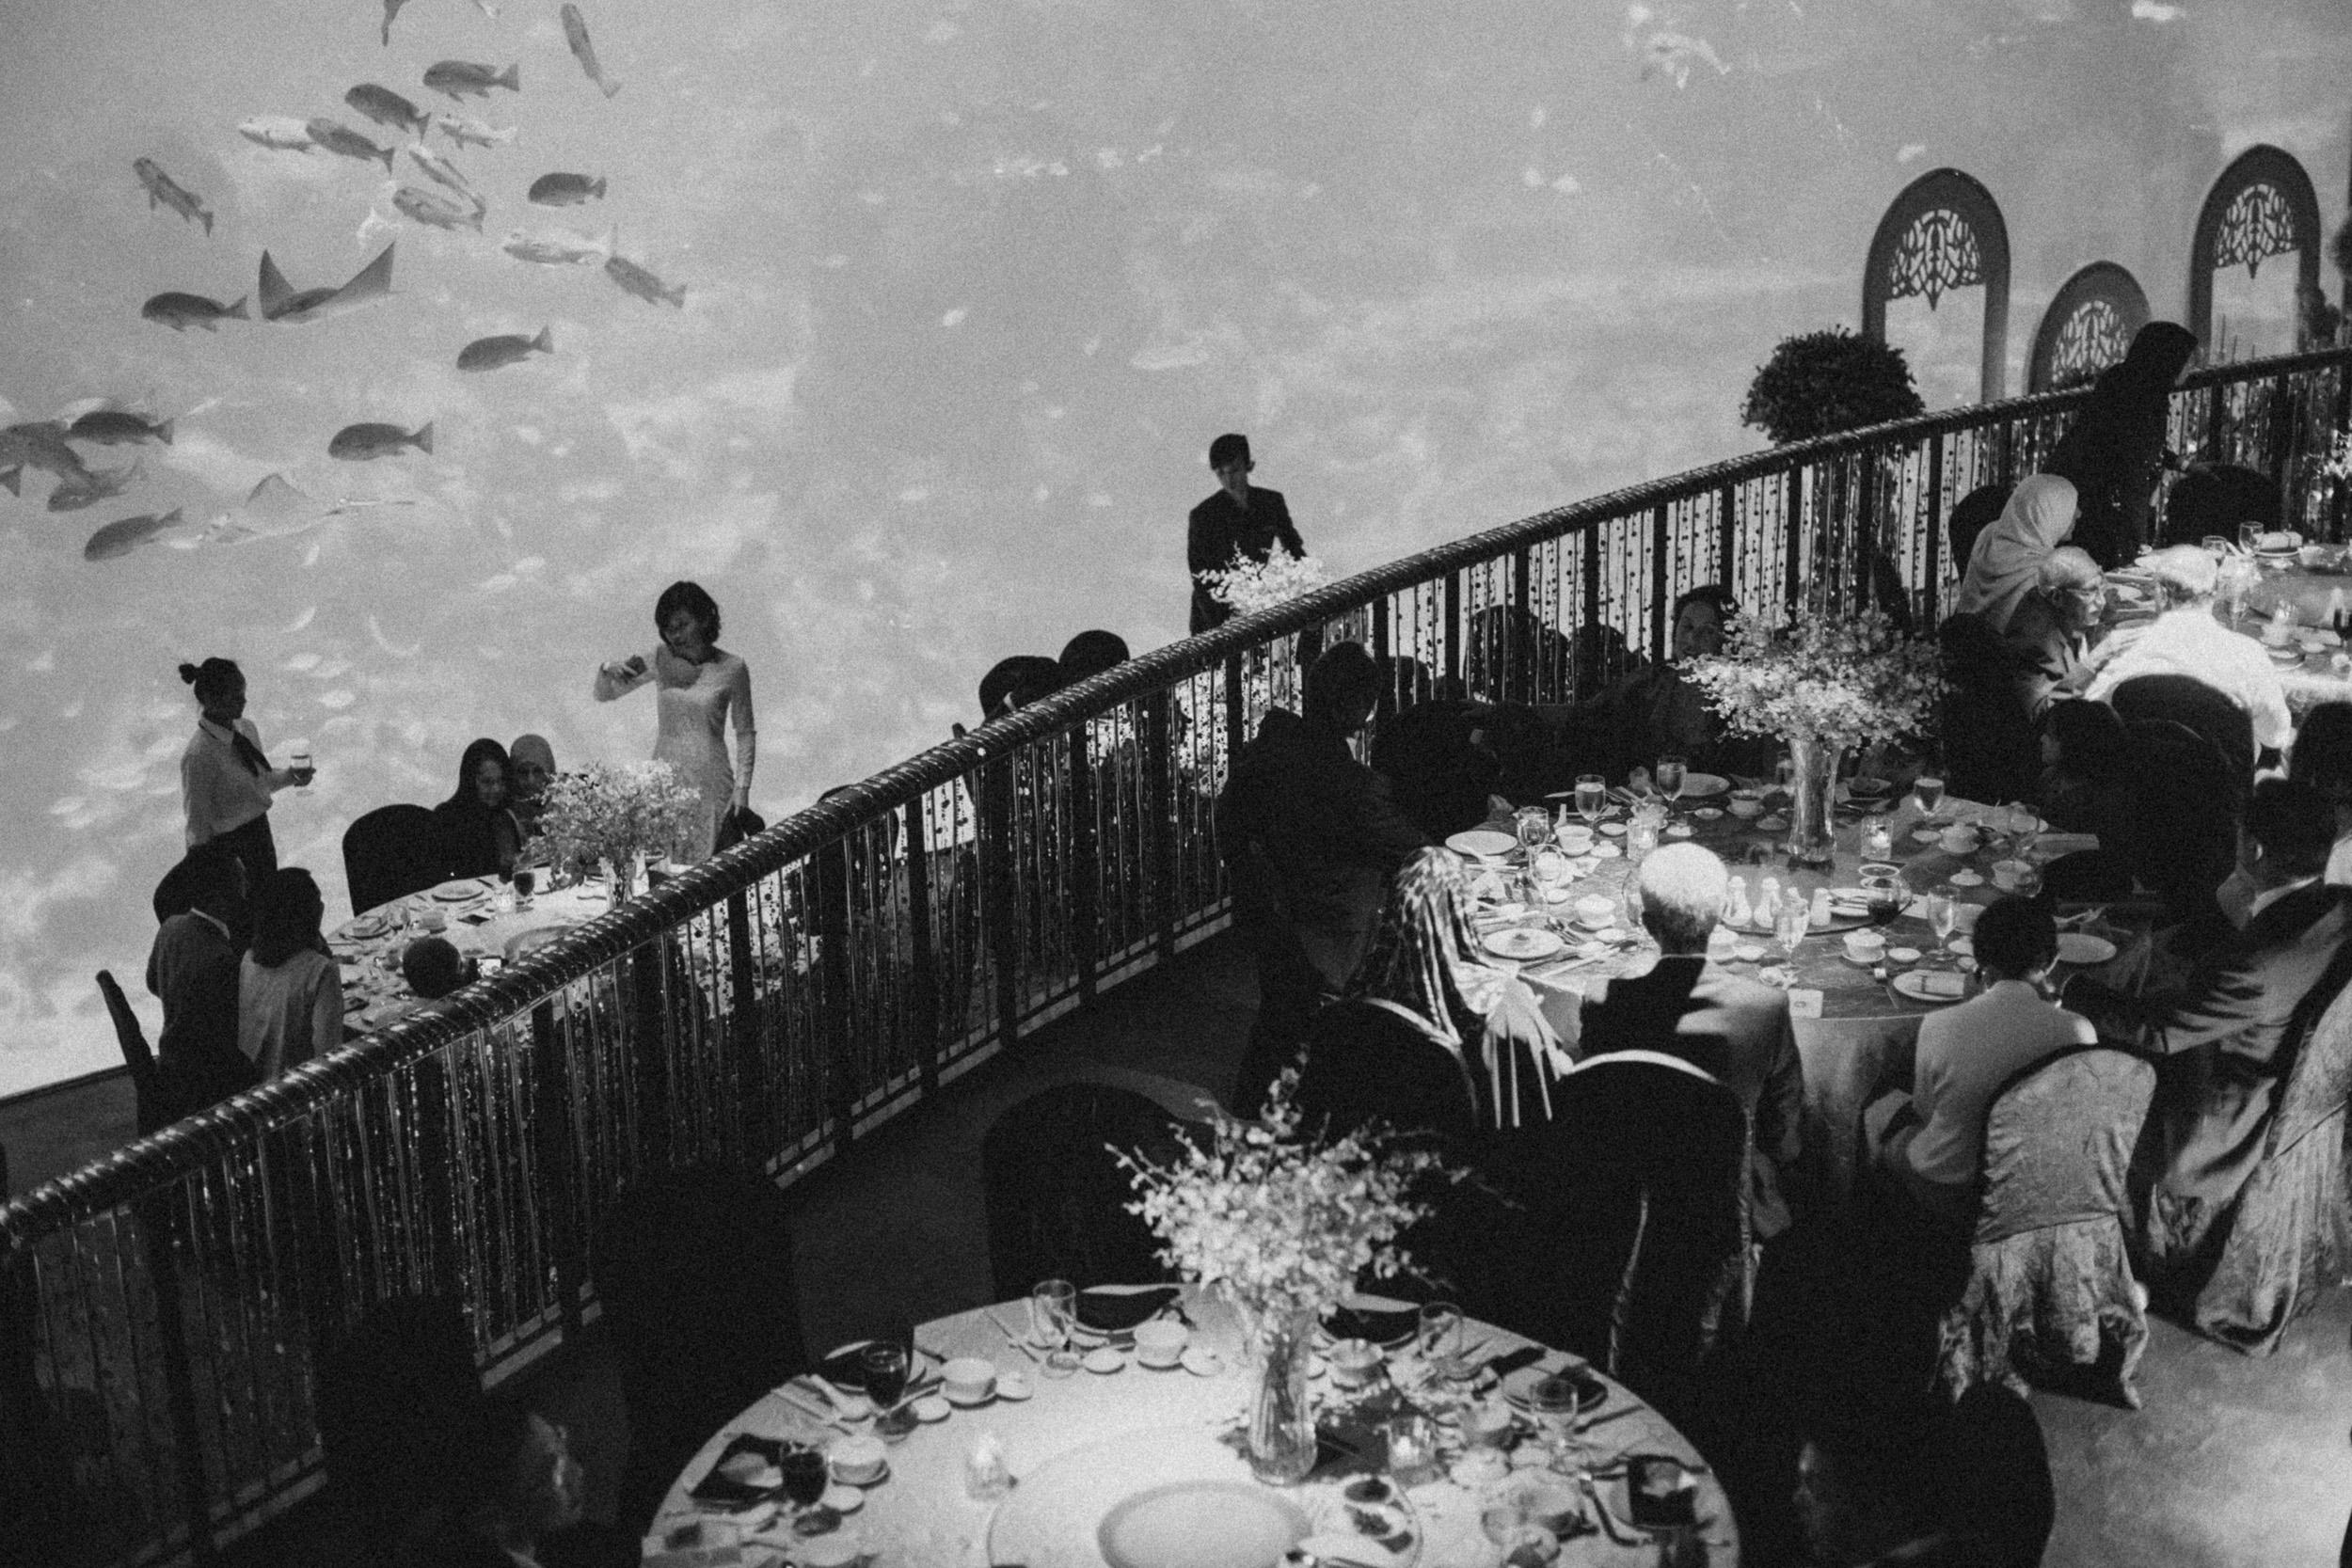 singapore-wedding-photographer-photography-wmt2017-024.jpg